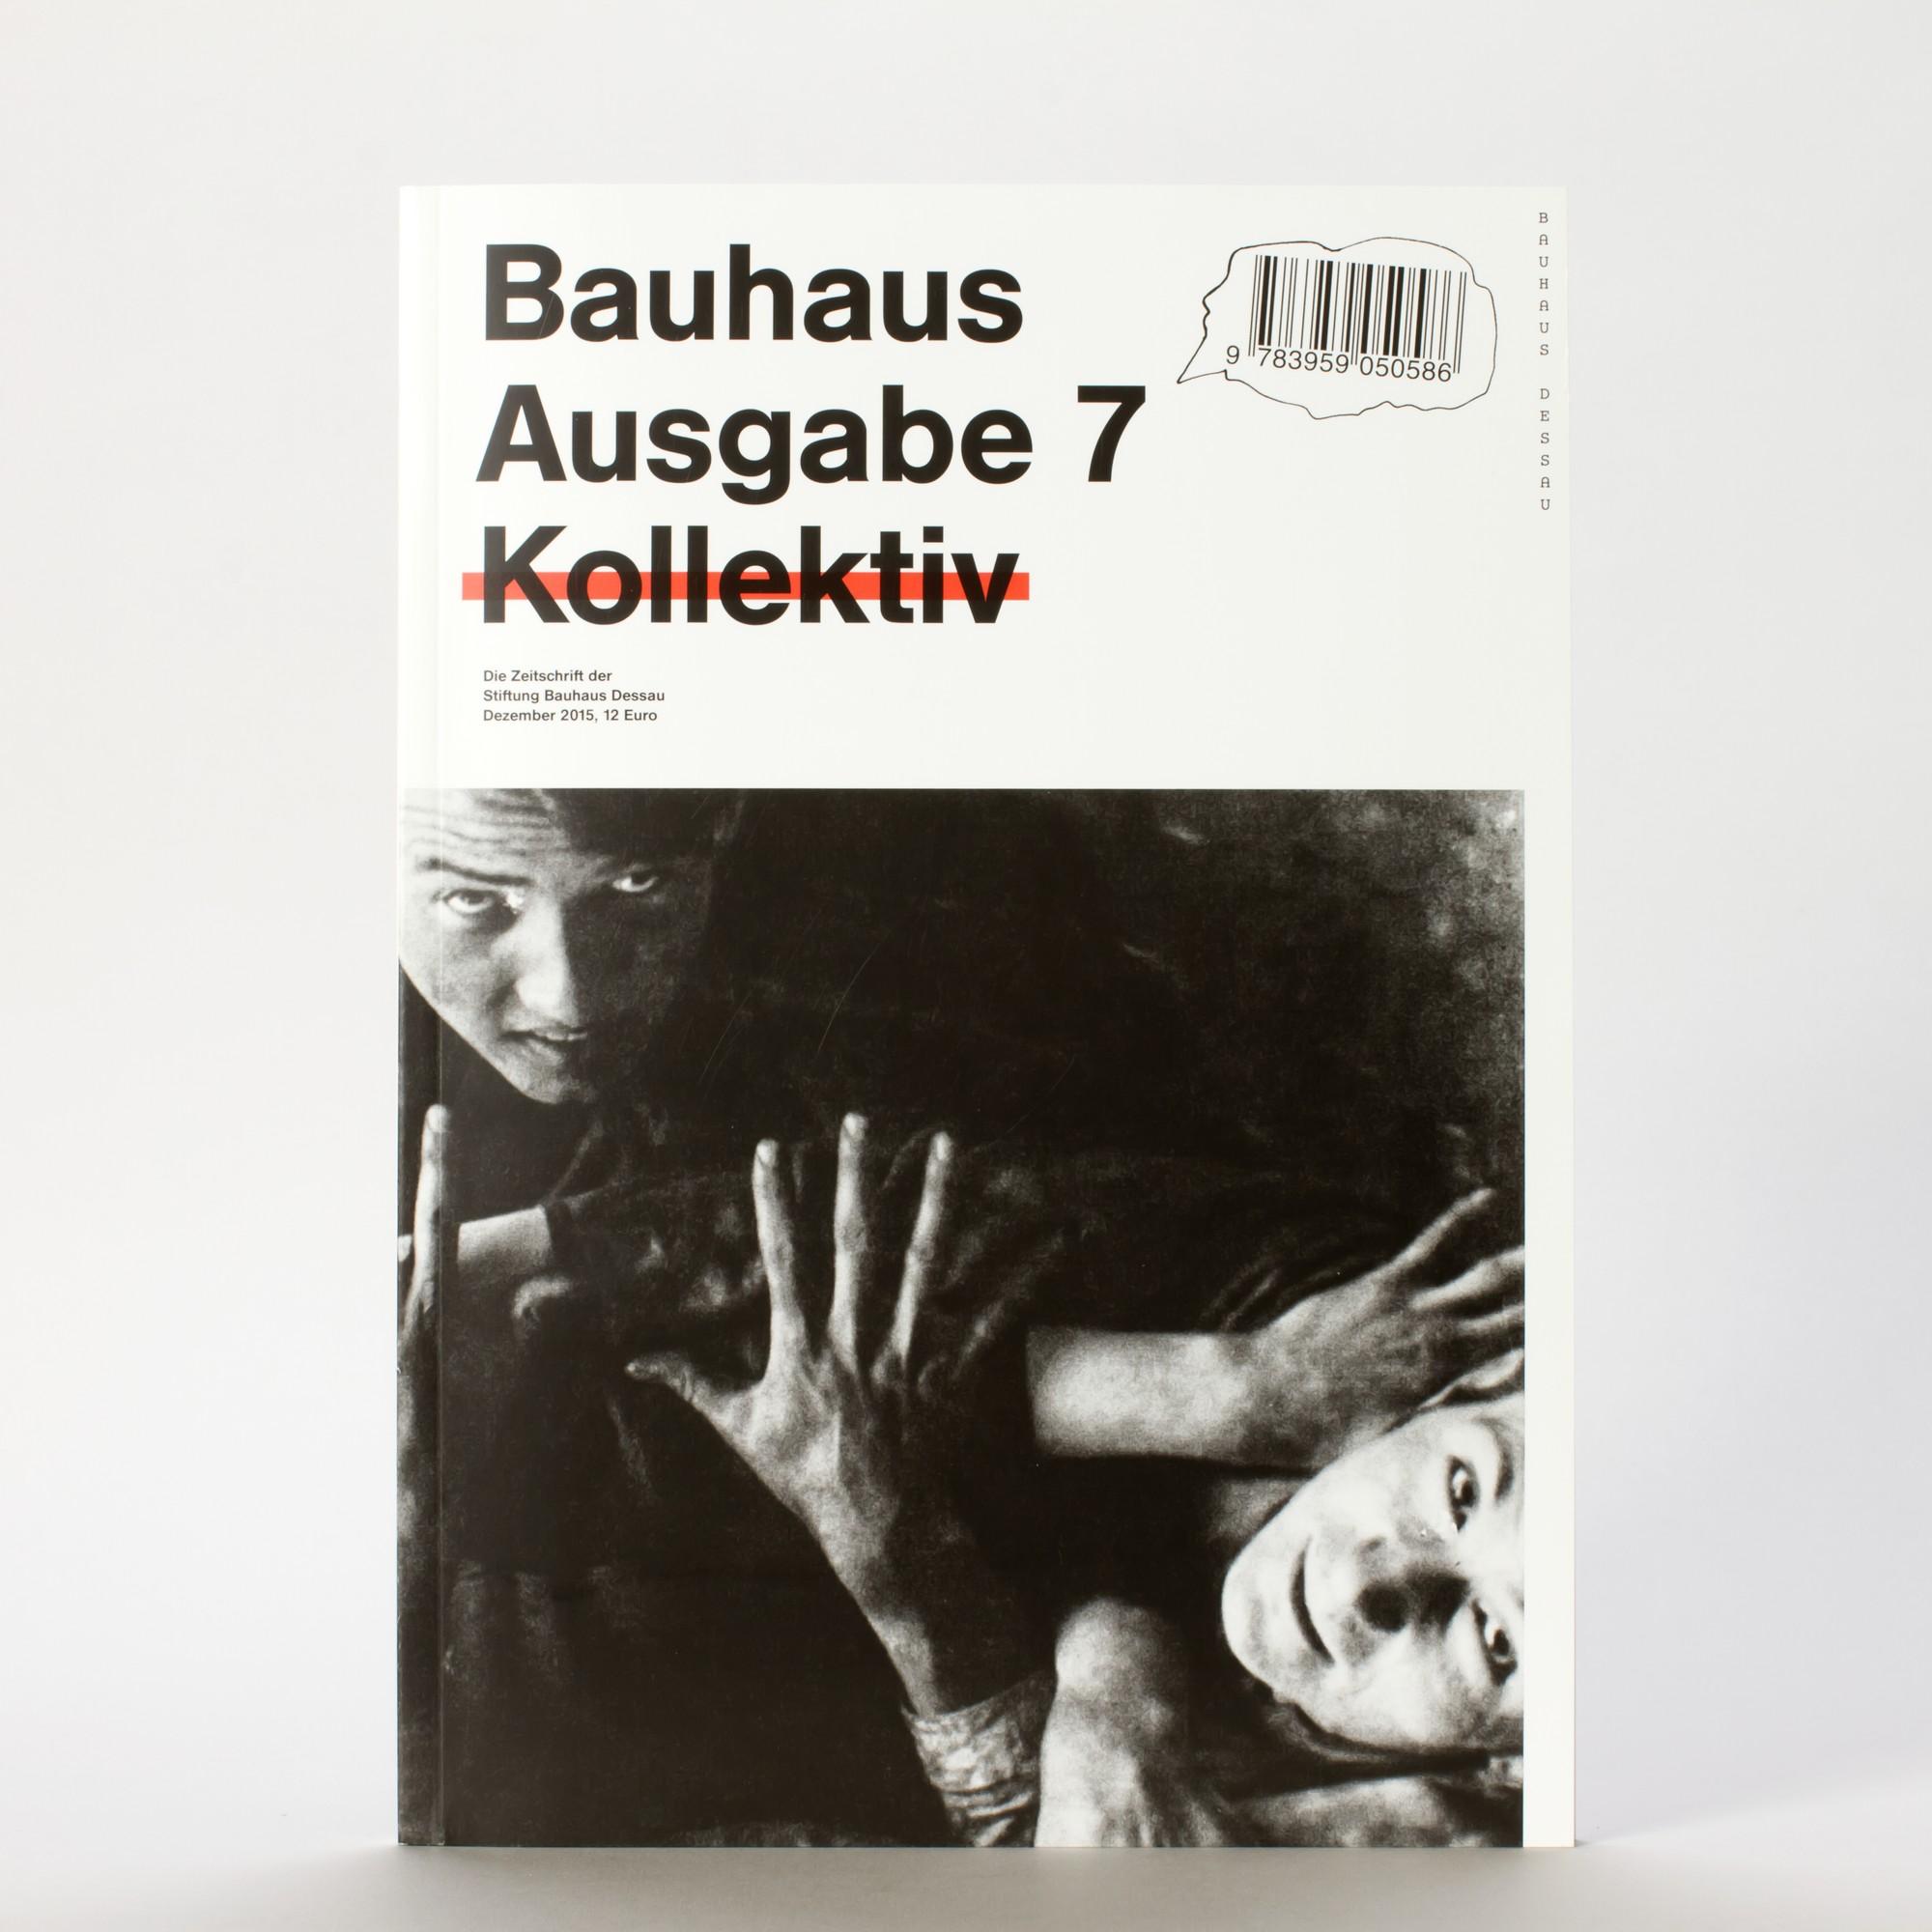 KOLLEKTIV . Bauhaus Zeitschrift Nr. 7 | ZEITSCHRIFTEN | BUCH ...